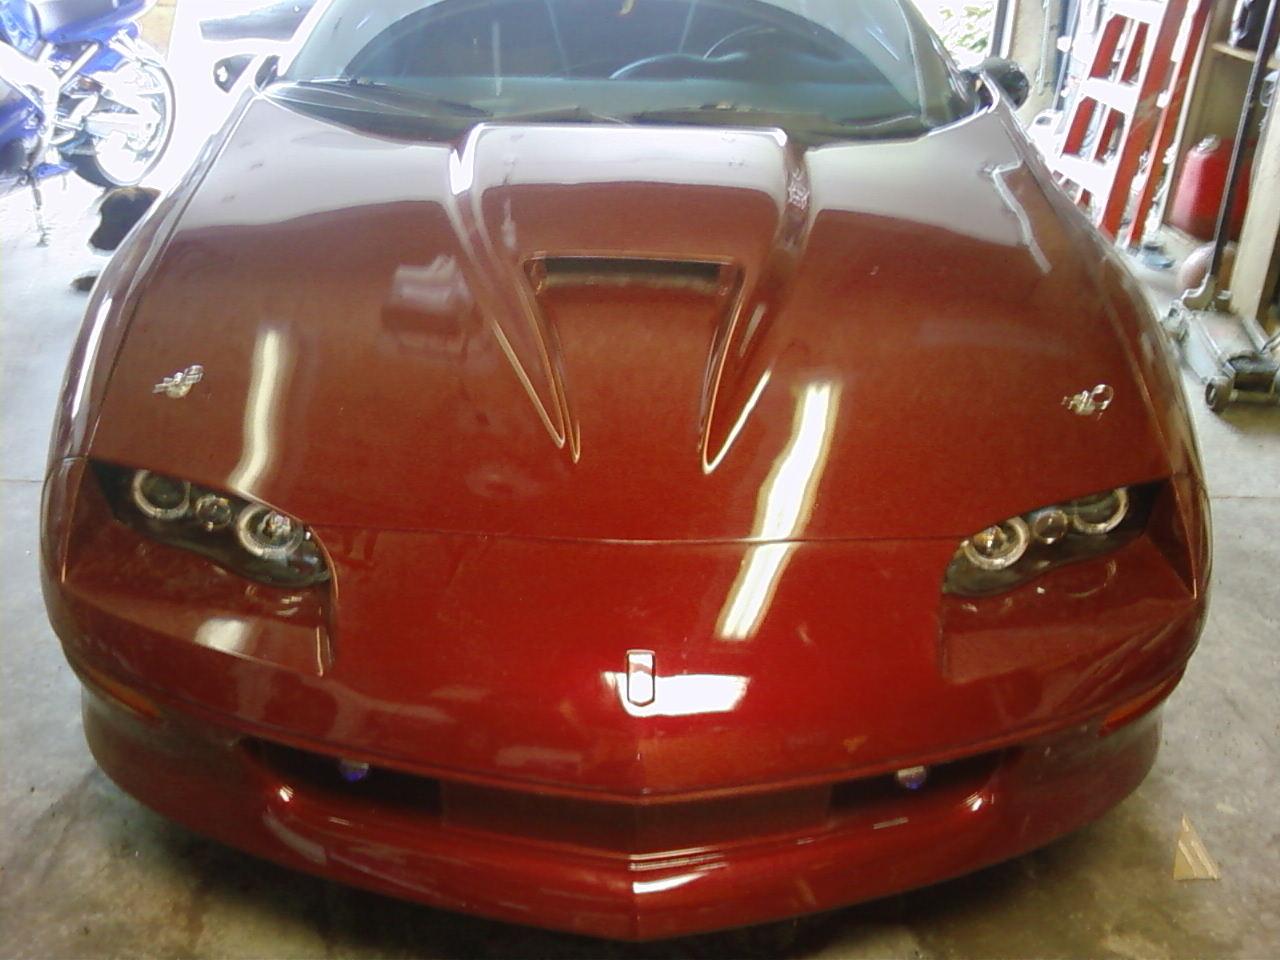 Will 98 02 headlights fit on my 94 camaro5 chevy camaro forum camaro zl1 ss and v6 forums camaro5 com